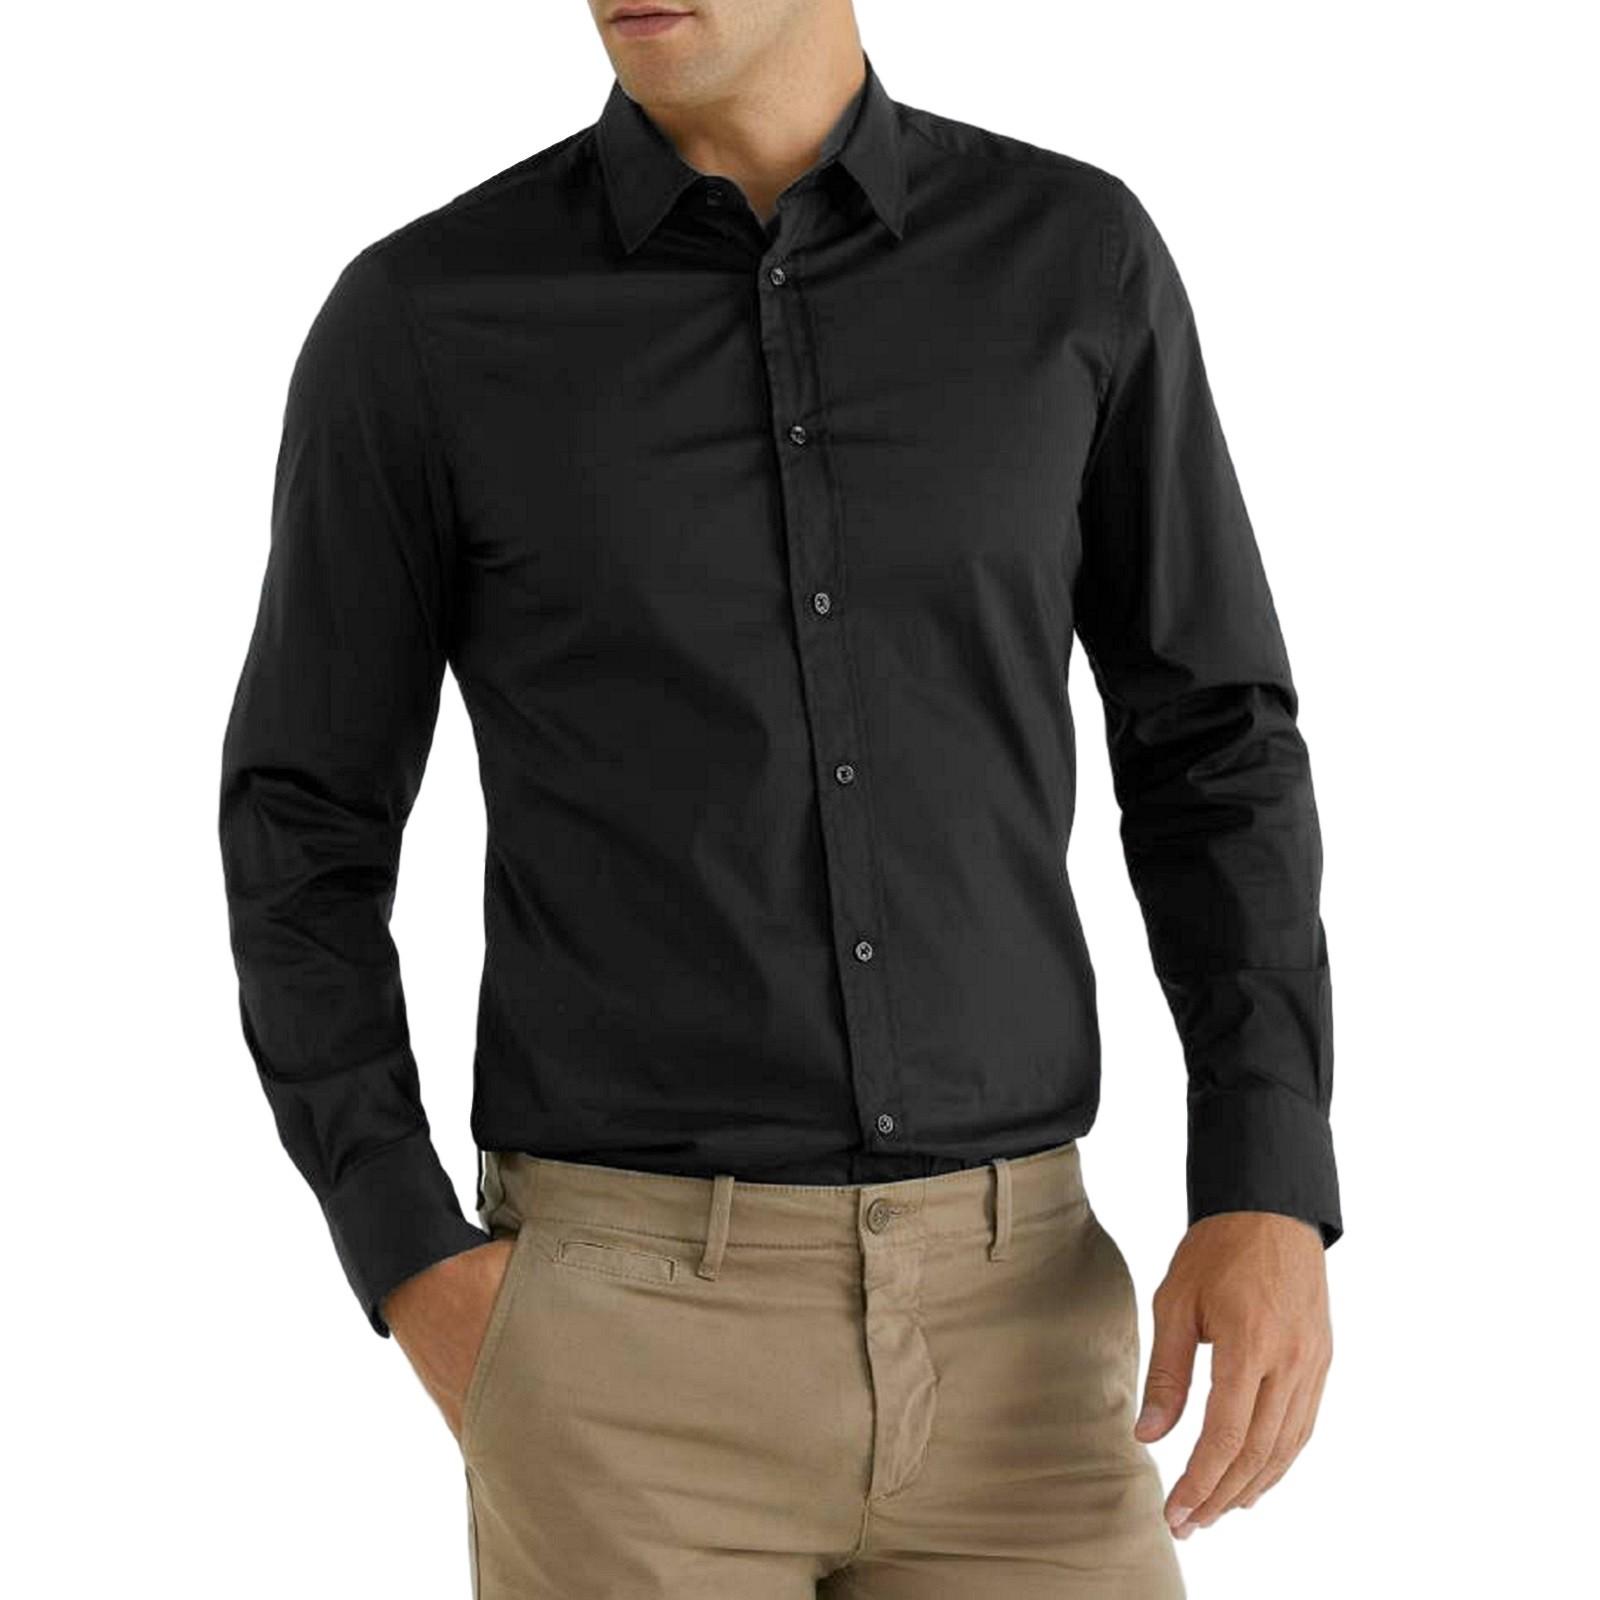 Camicia-Uomo-Celeste-Bianca-Slim-Fit-Manica-Lunga-Sartoriale-Cotone-TG-S-7XL miniatura 28